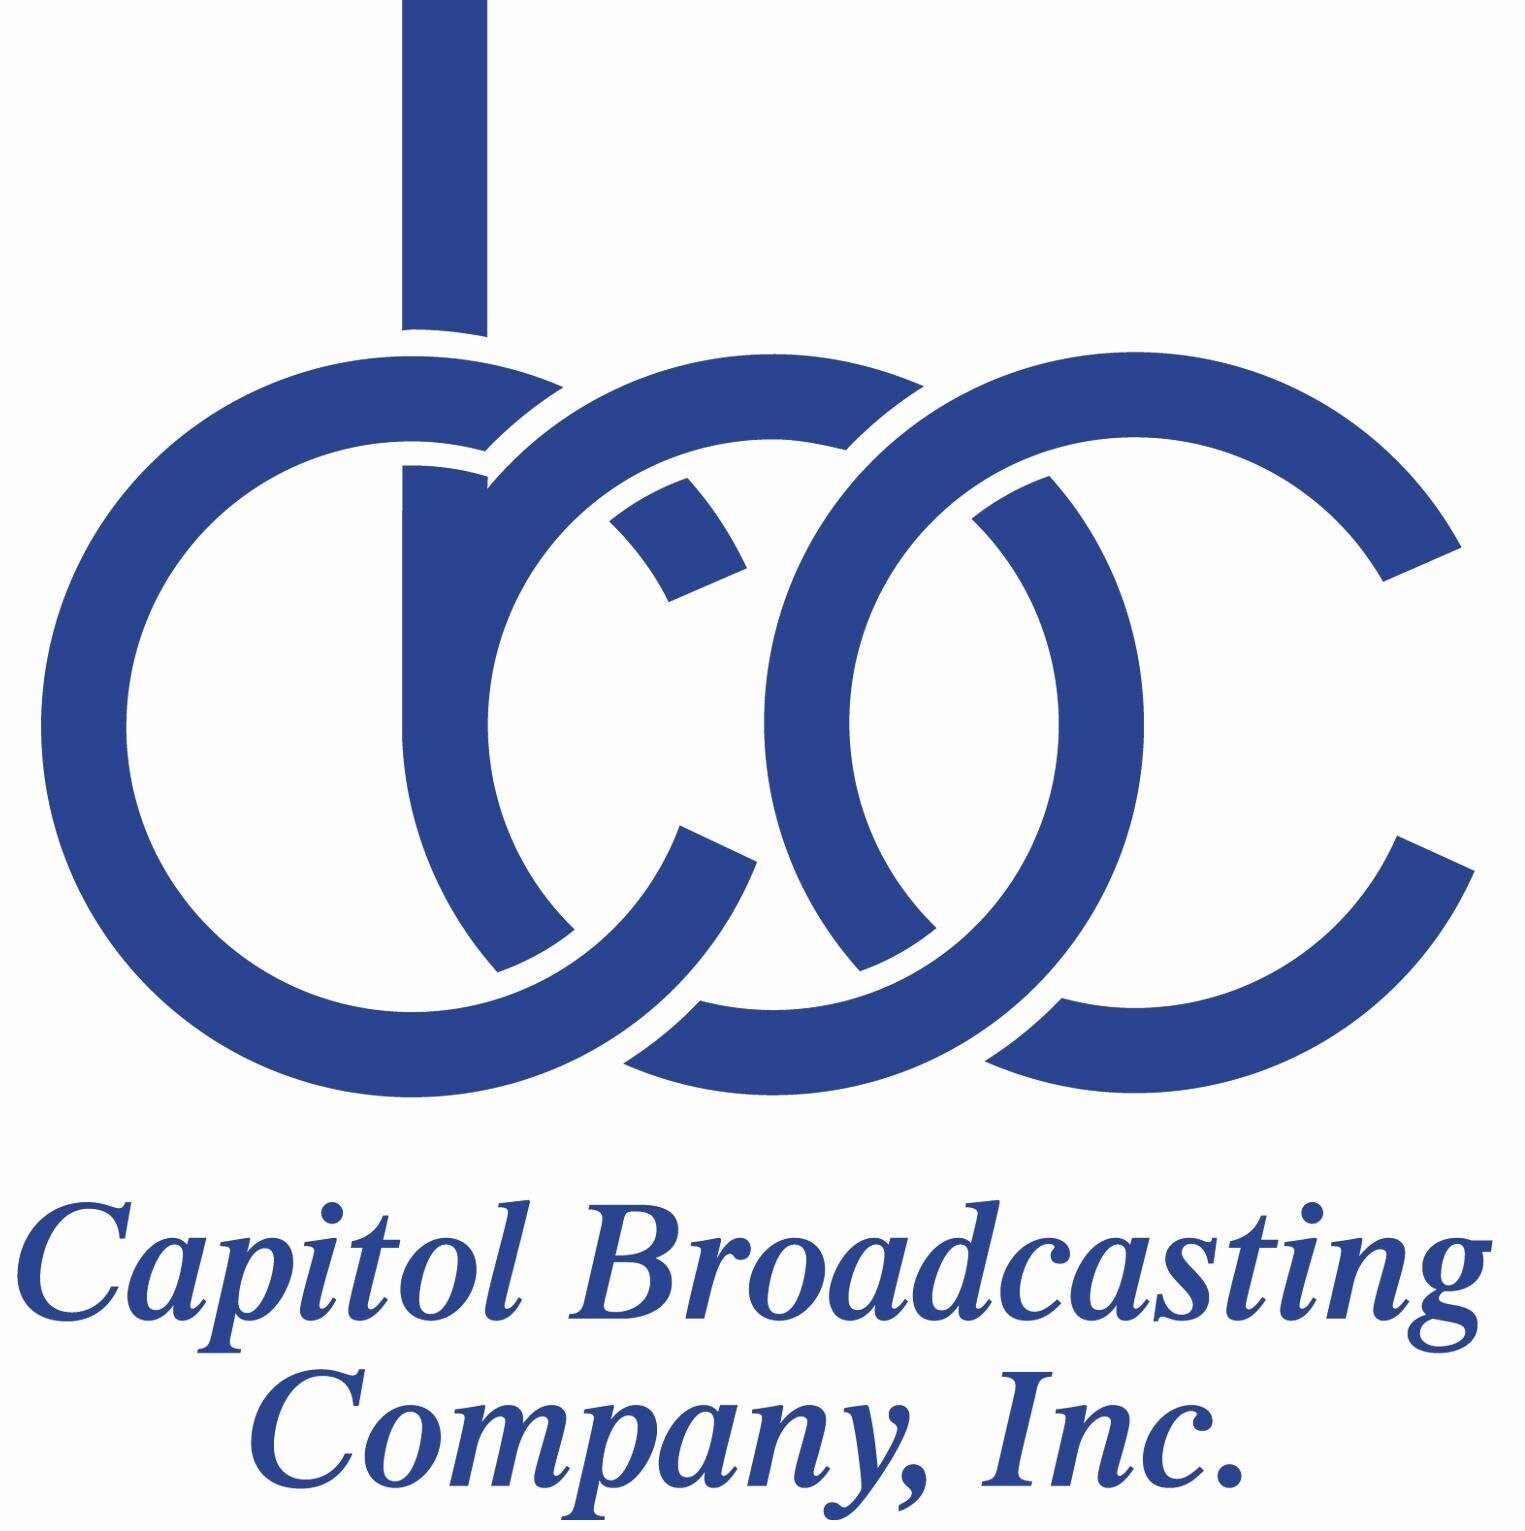 Capitol Broadcasting